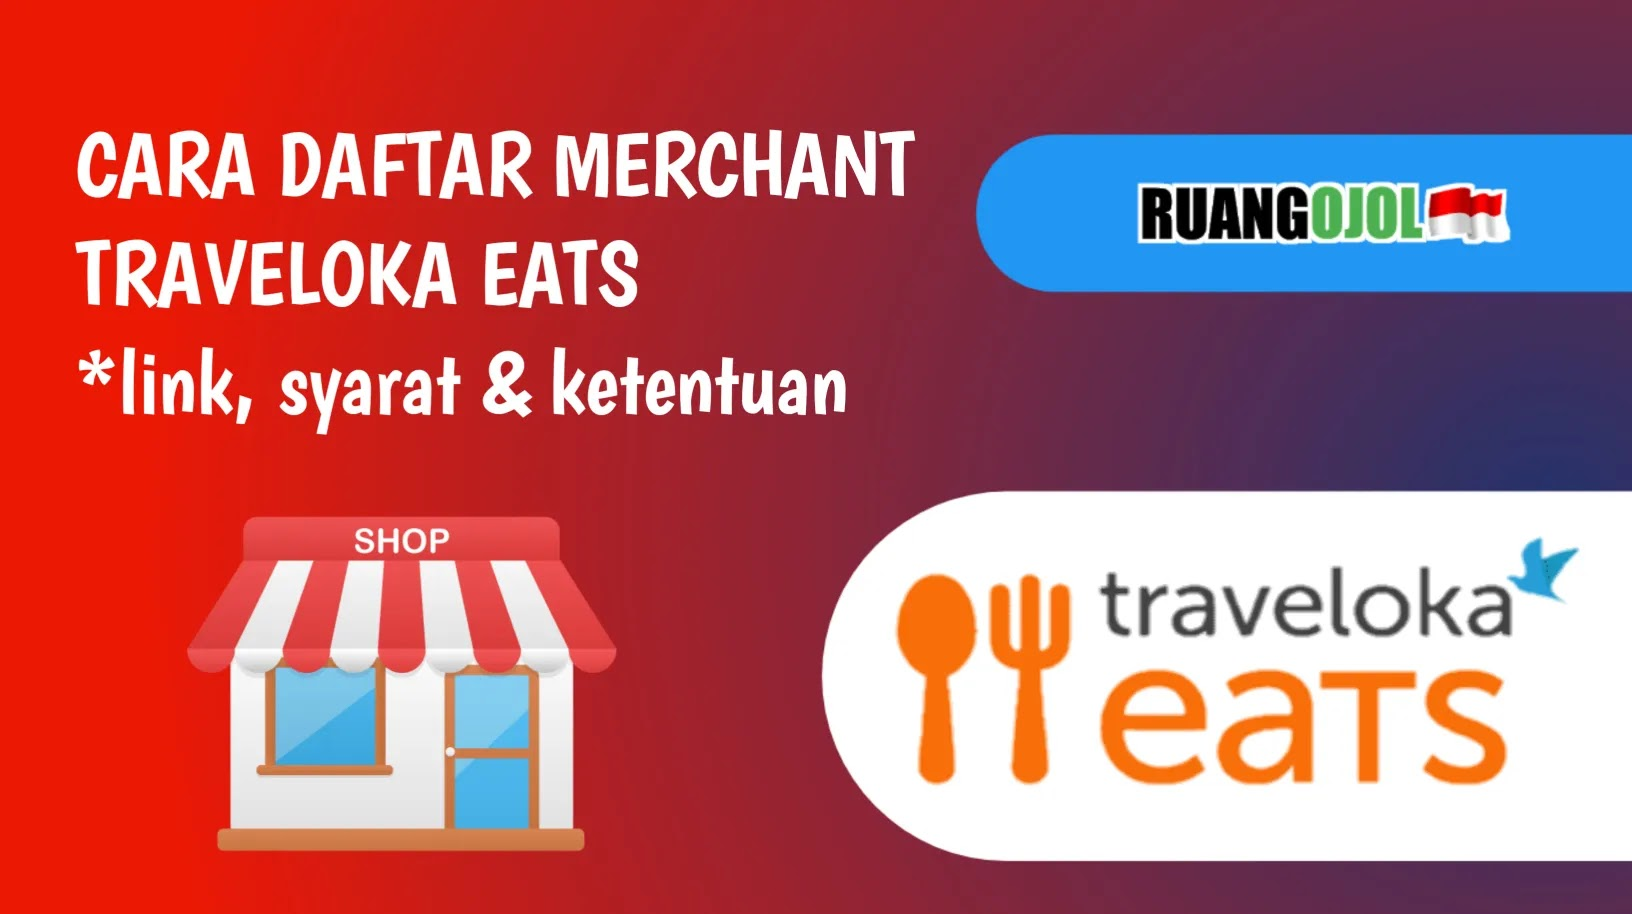 cara daftar traveloka eats merchant